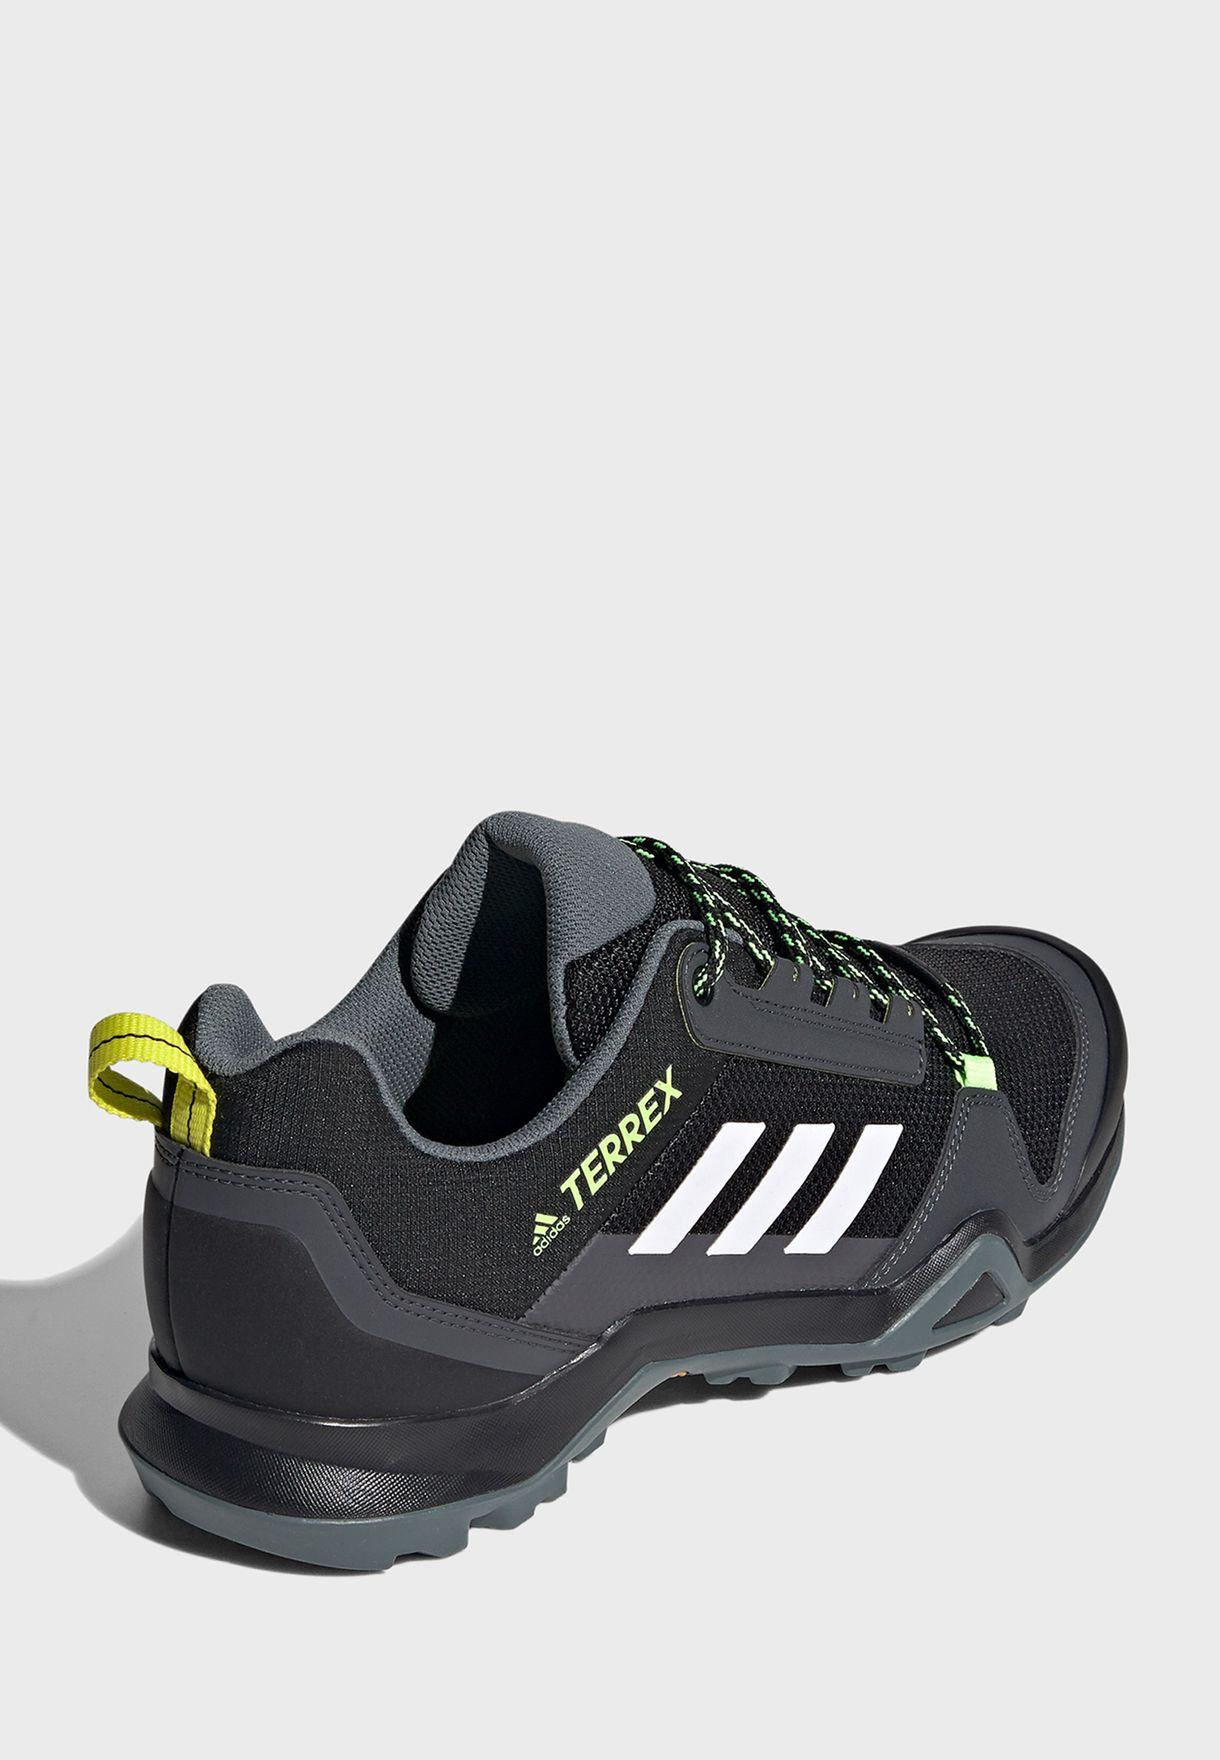 حذاء تيركس ايه اكس 3